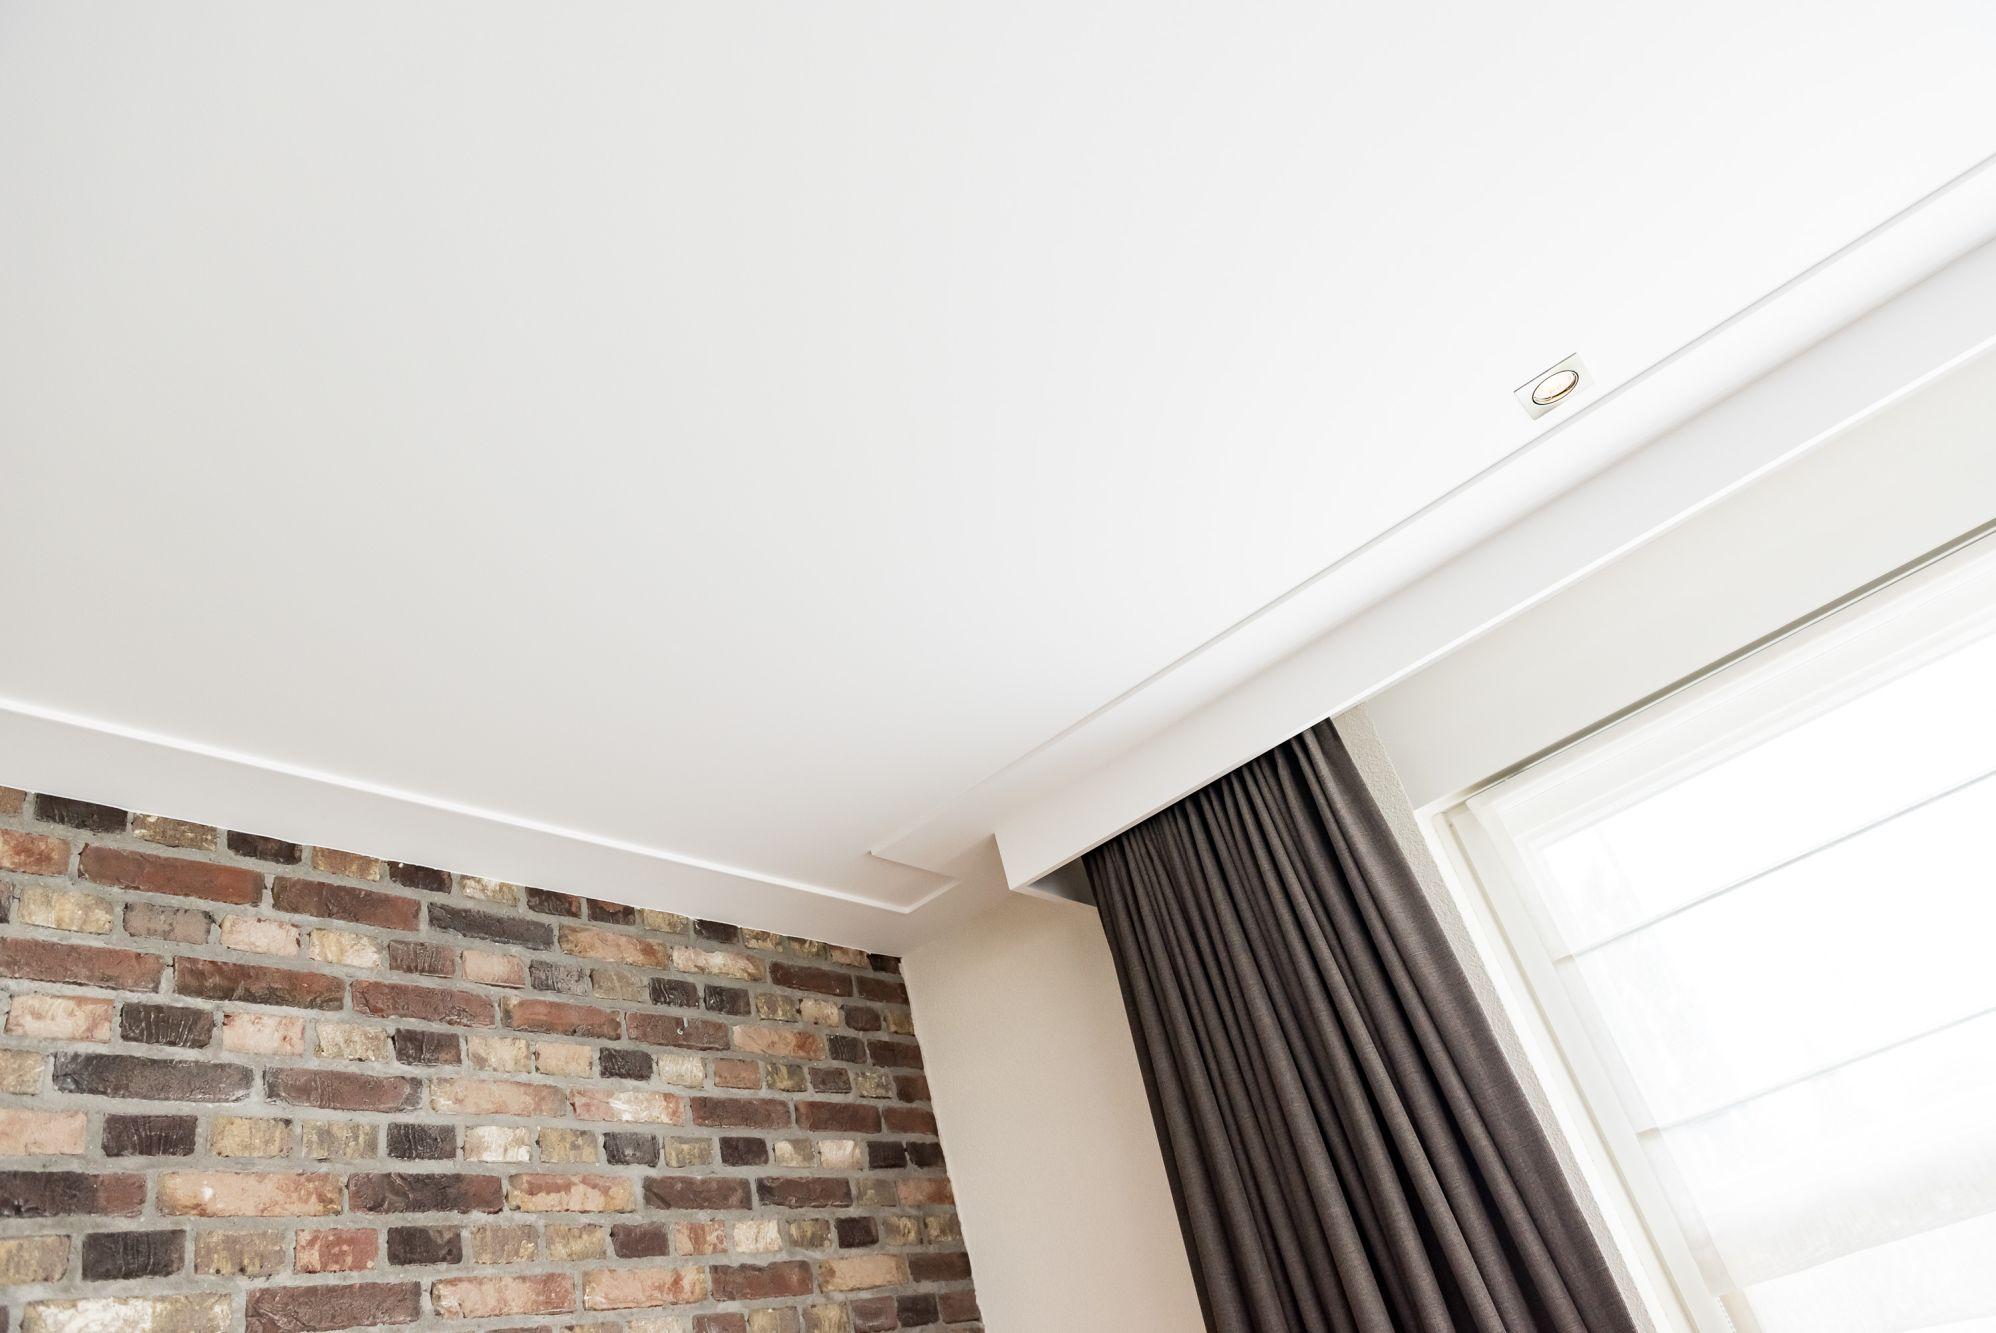 plafond glad stucwerk met platte plint en gordijnkast